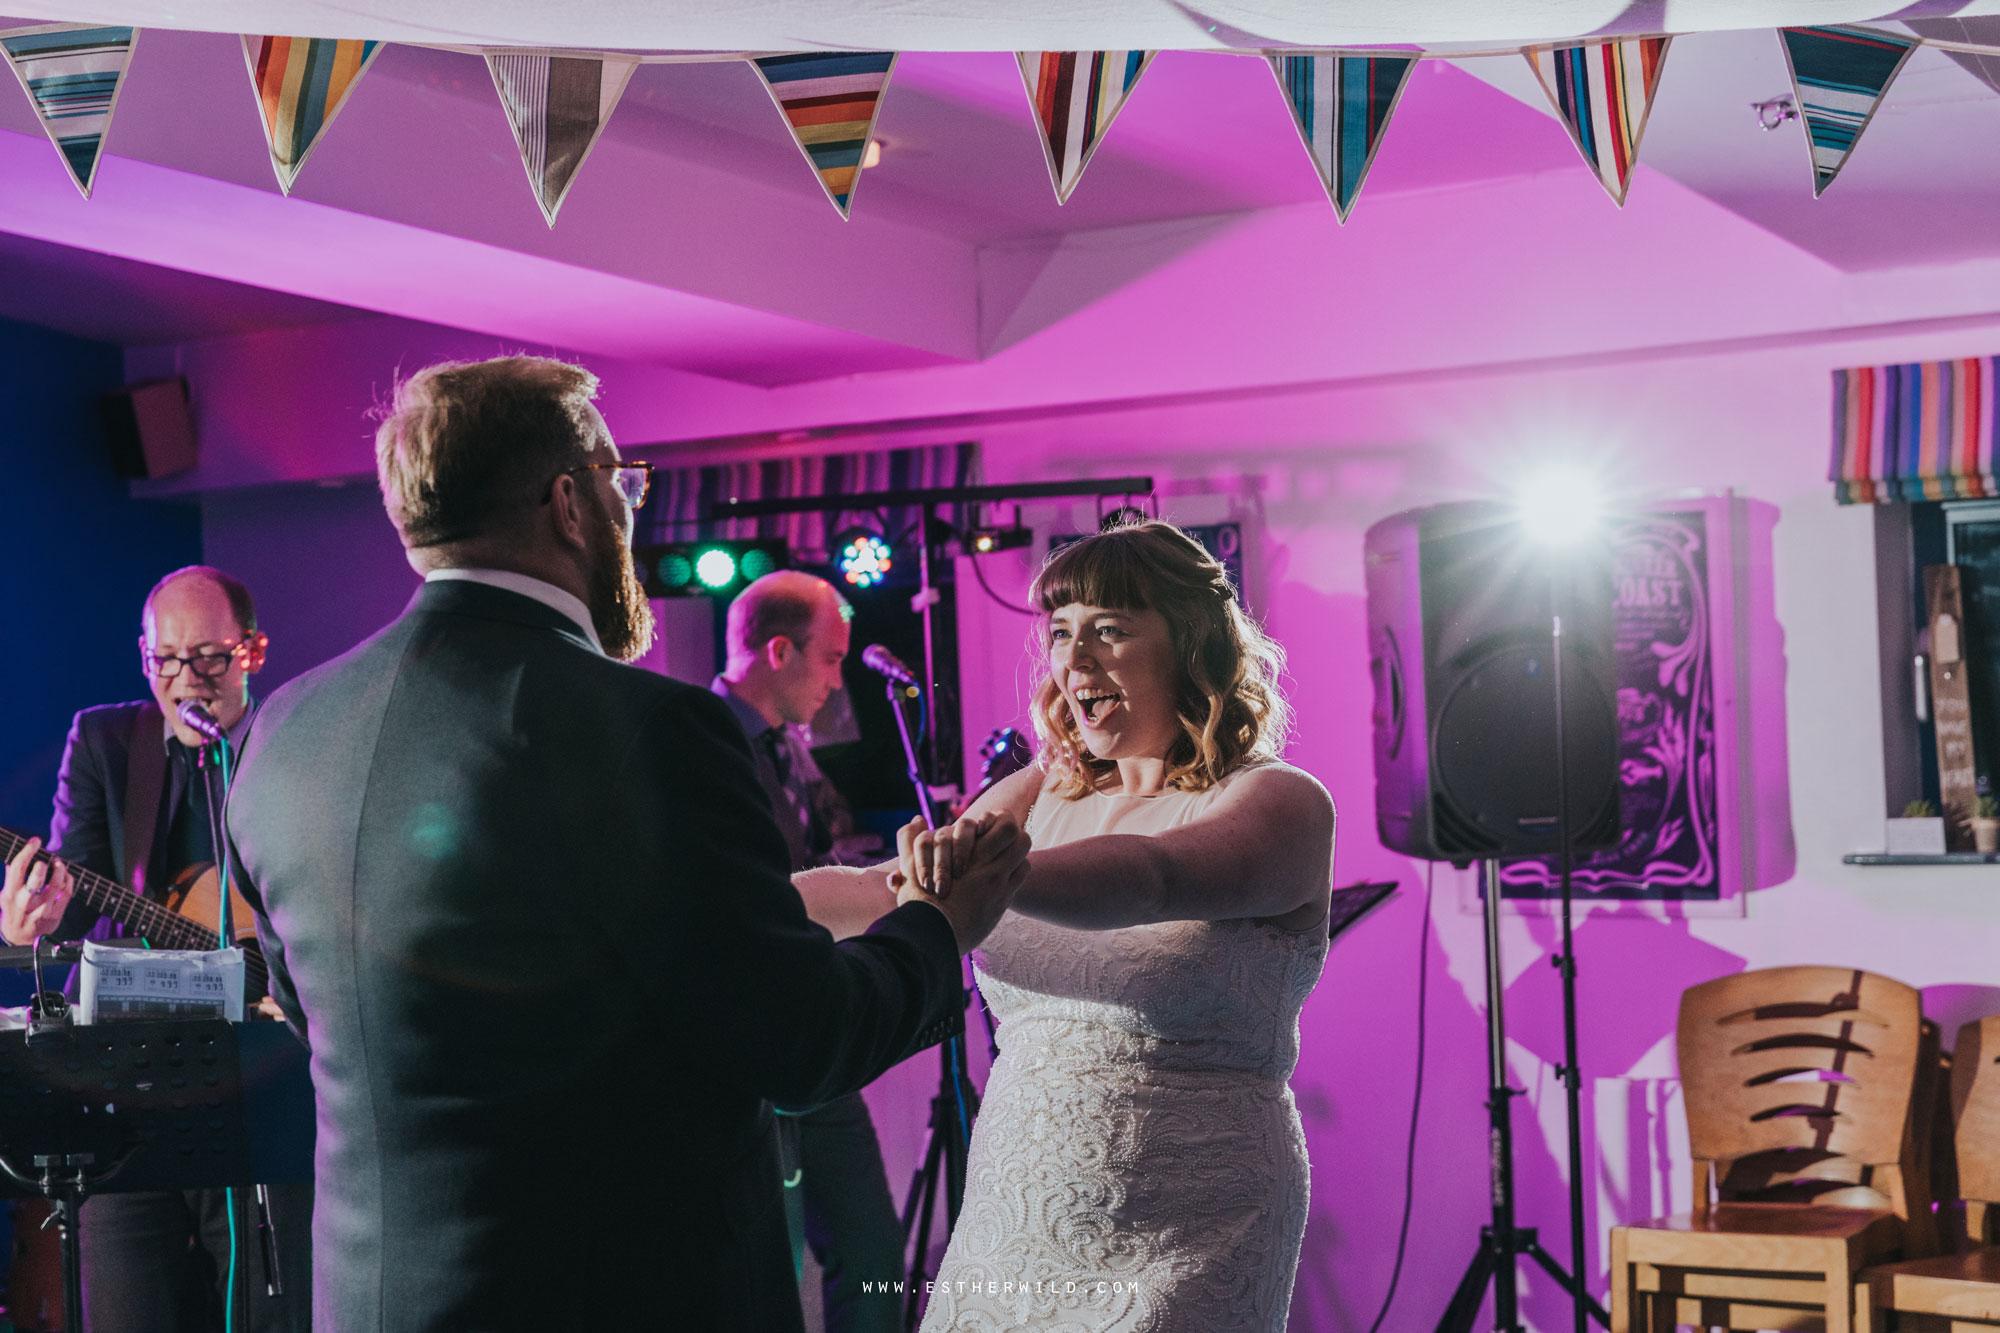 Cromer_Wedding_Beach_Outdoor_Ceremony_Norfolk_North_Lodge_Registry_Office_Rocket_House_Cafe_Cromer_Pier_IMG_5509.jpg